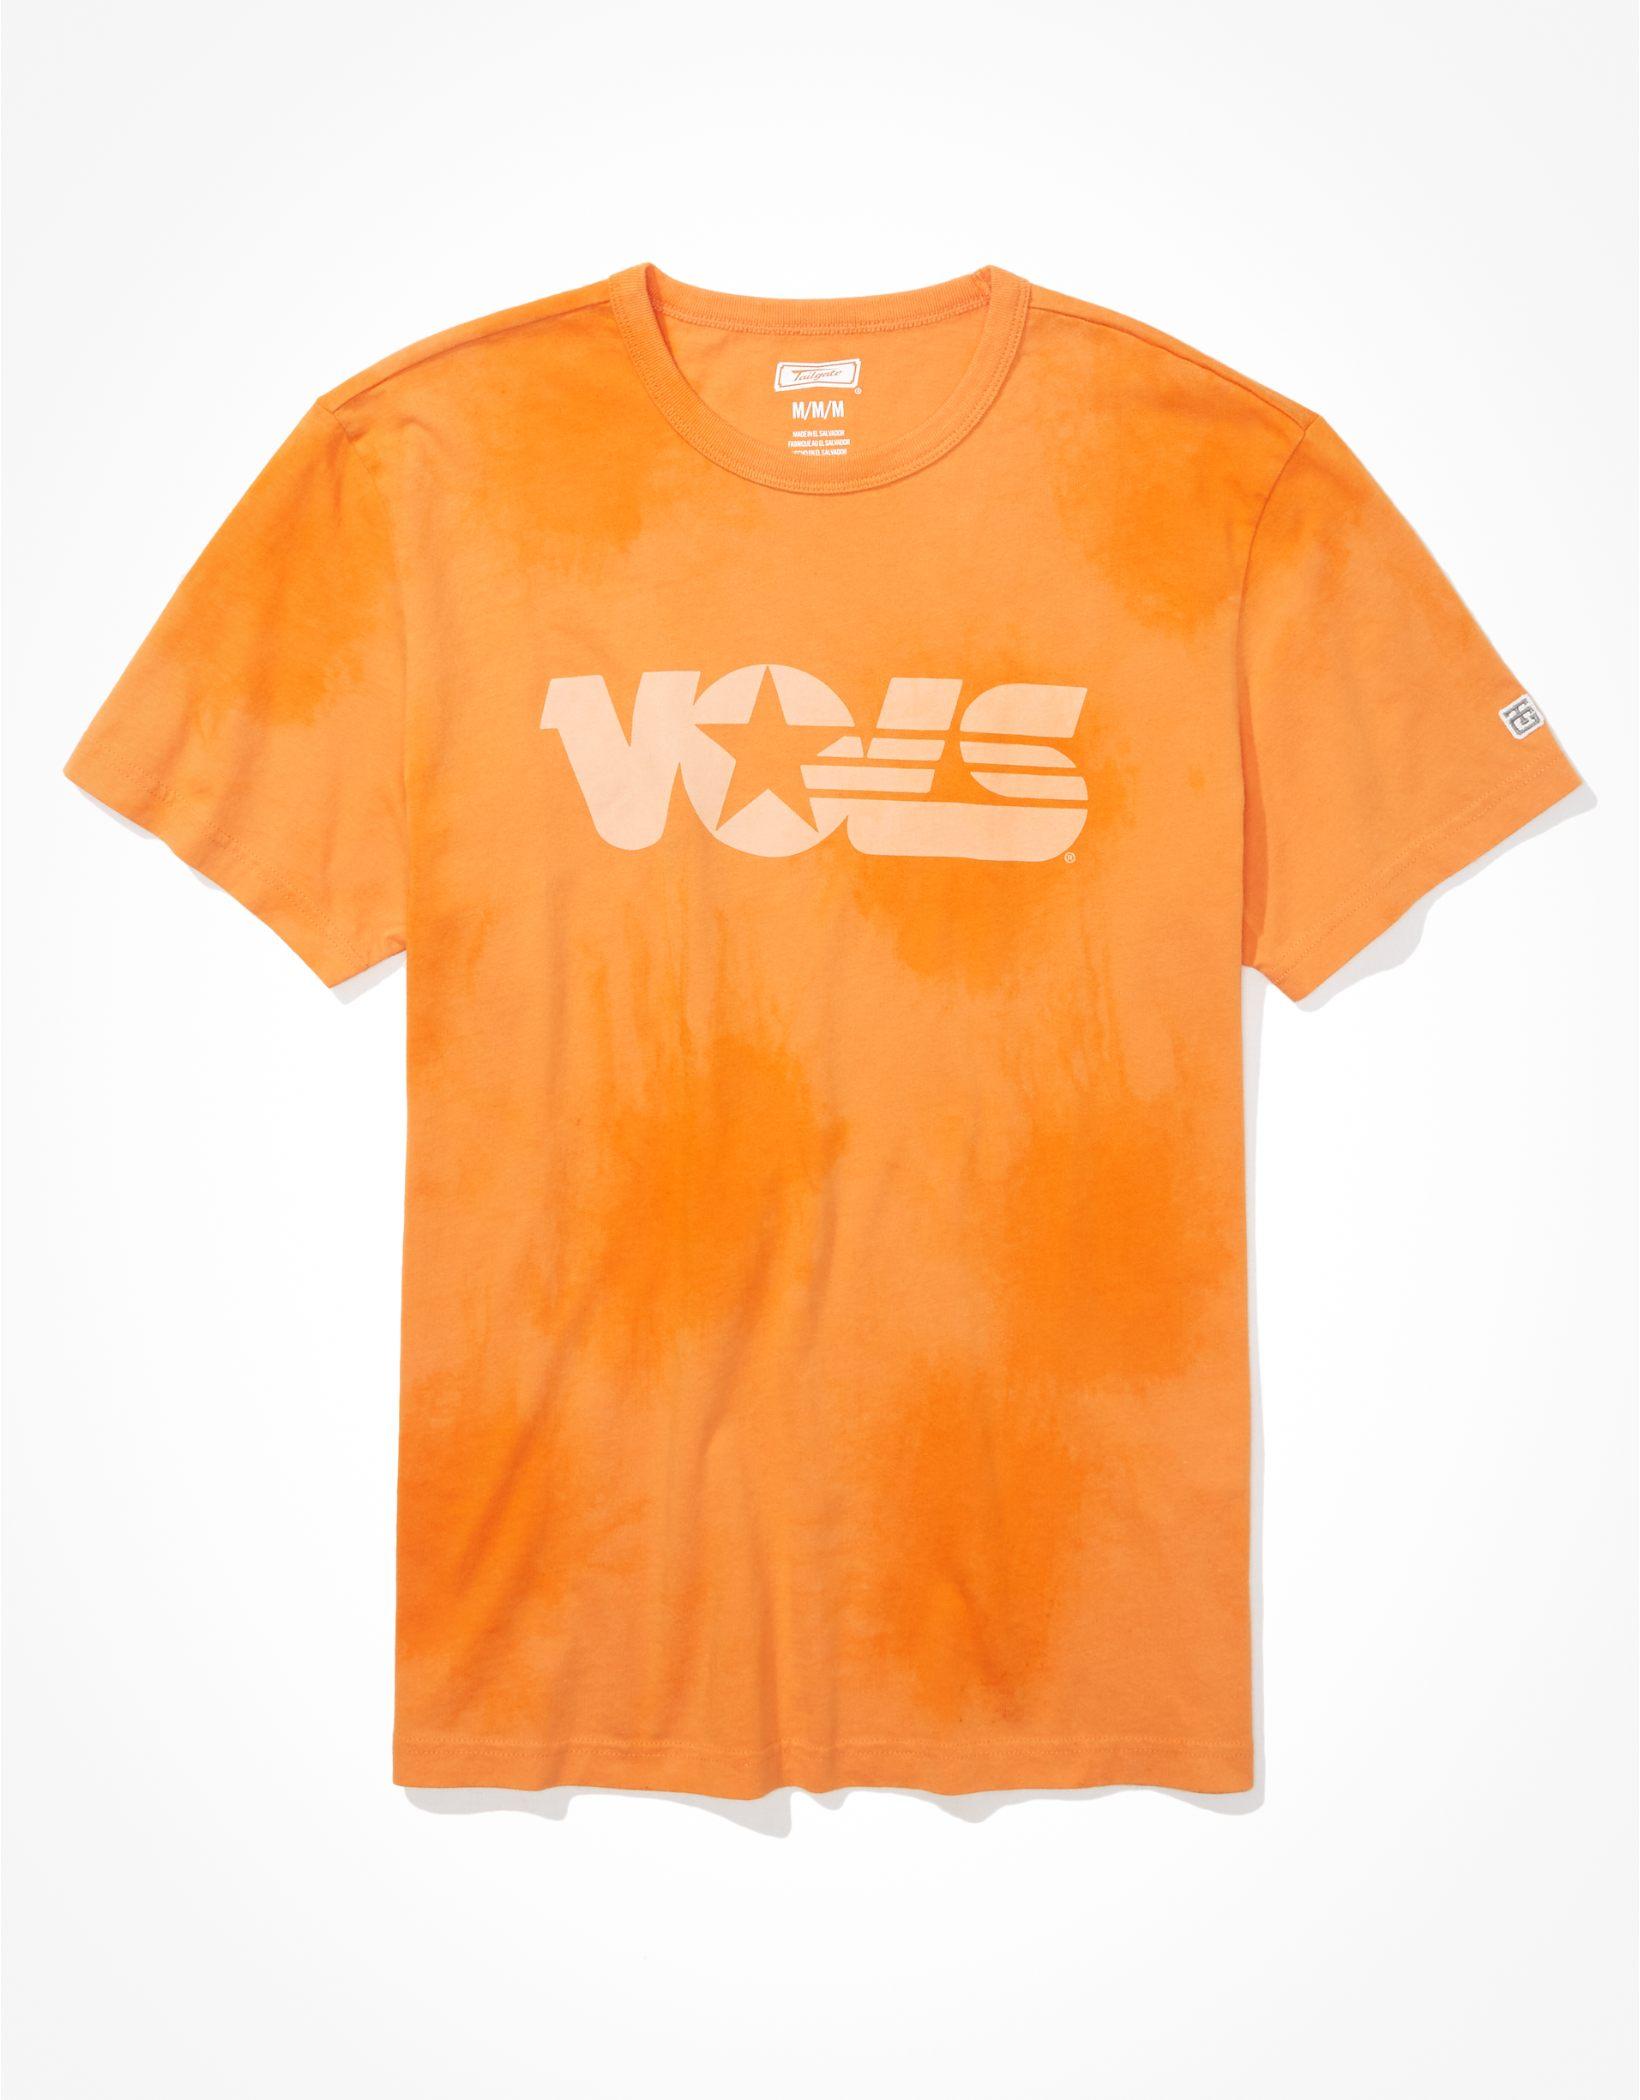 Tailgate Men's Tennessee Vols Tonal Tie-Dye T-Shirt